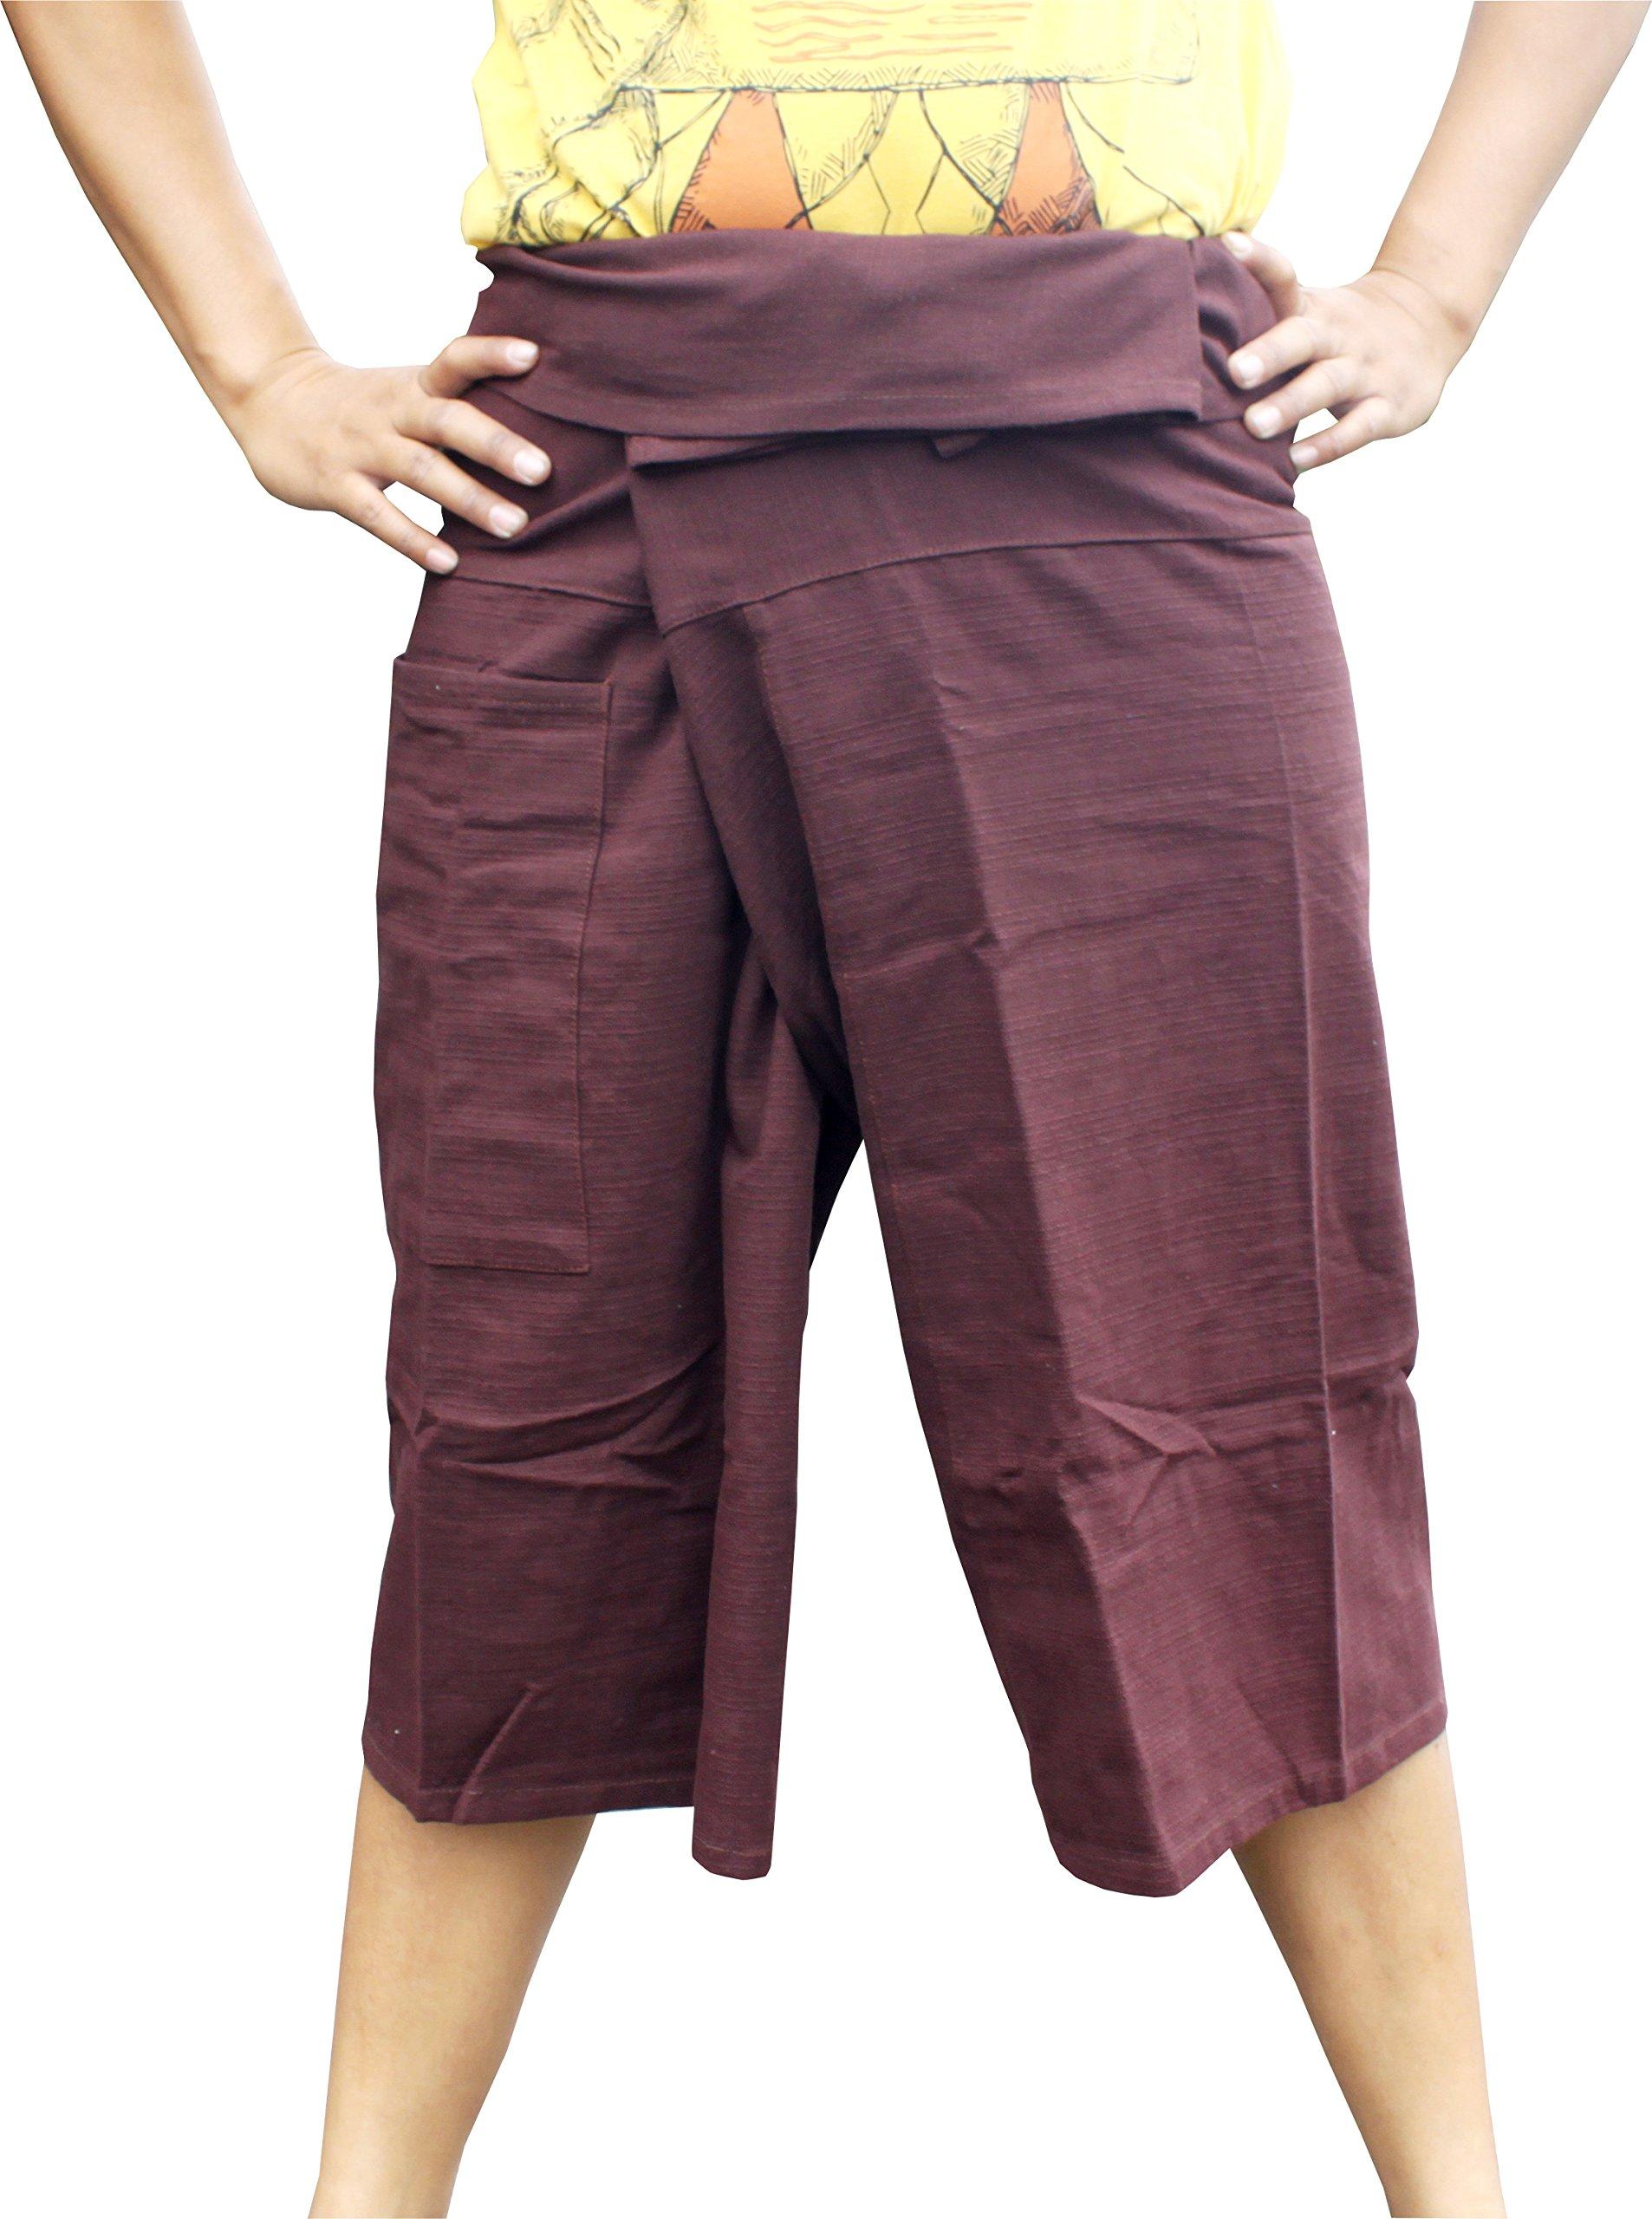 Raan Pah Muang RaanPahMuang Brand Thick Line Cotton Thai Fisherman Capri Wrap Pants, Small, Sienna Brown by Raan Pah Muang